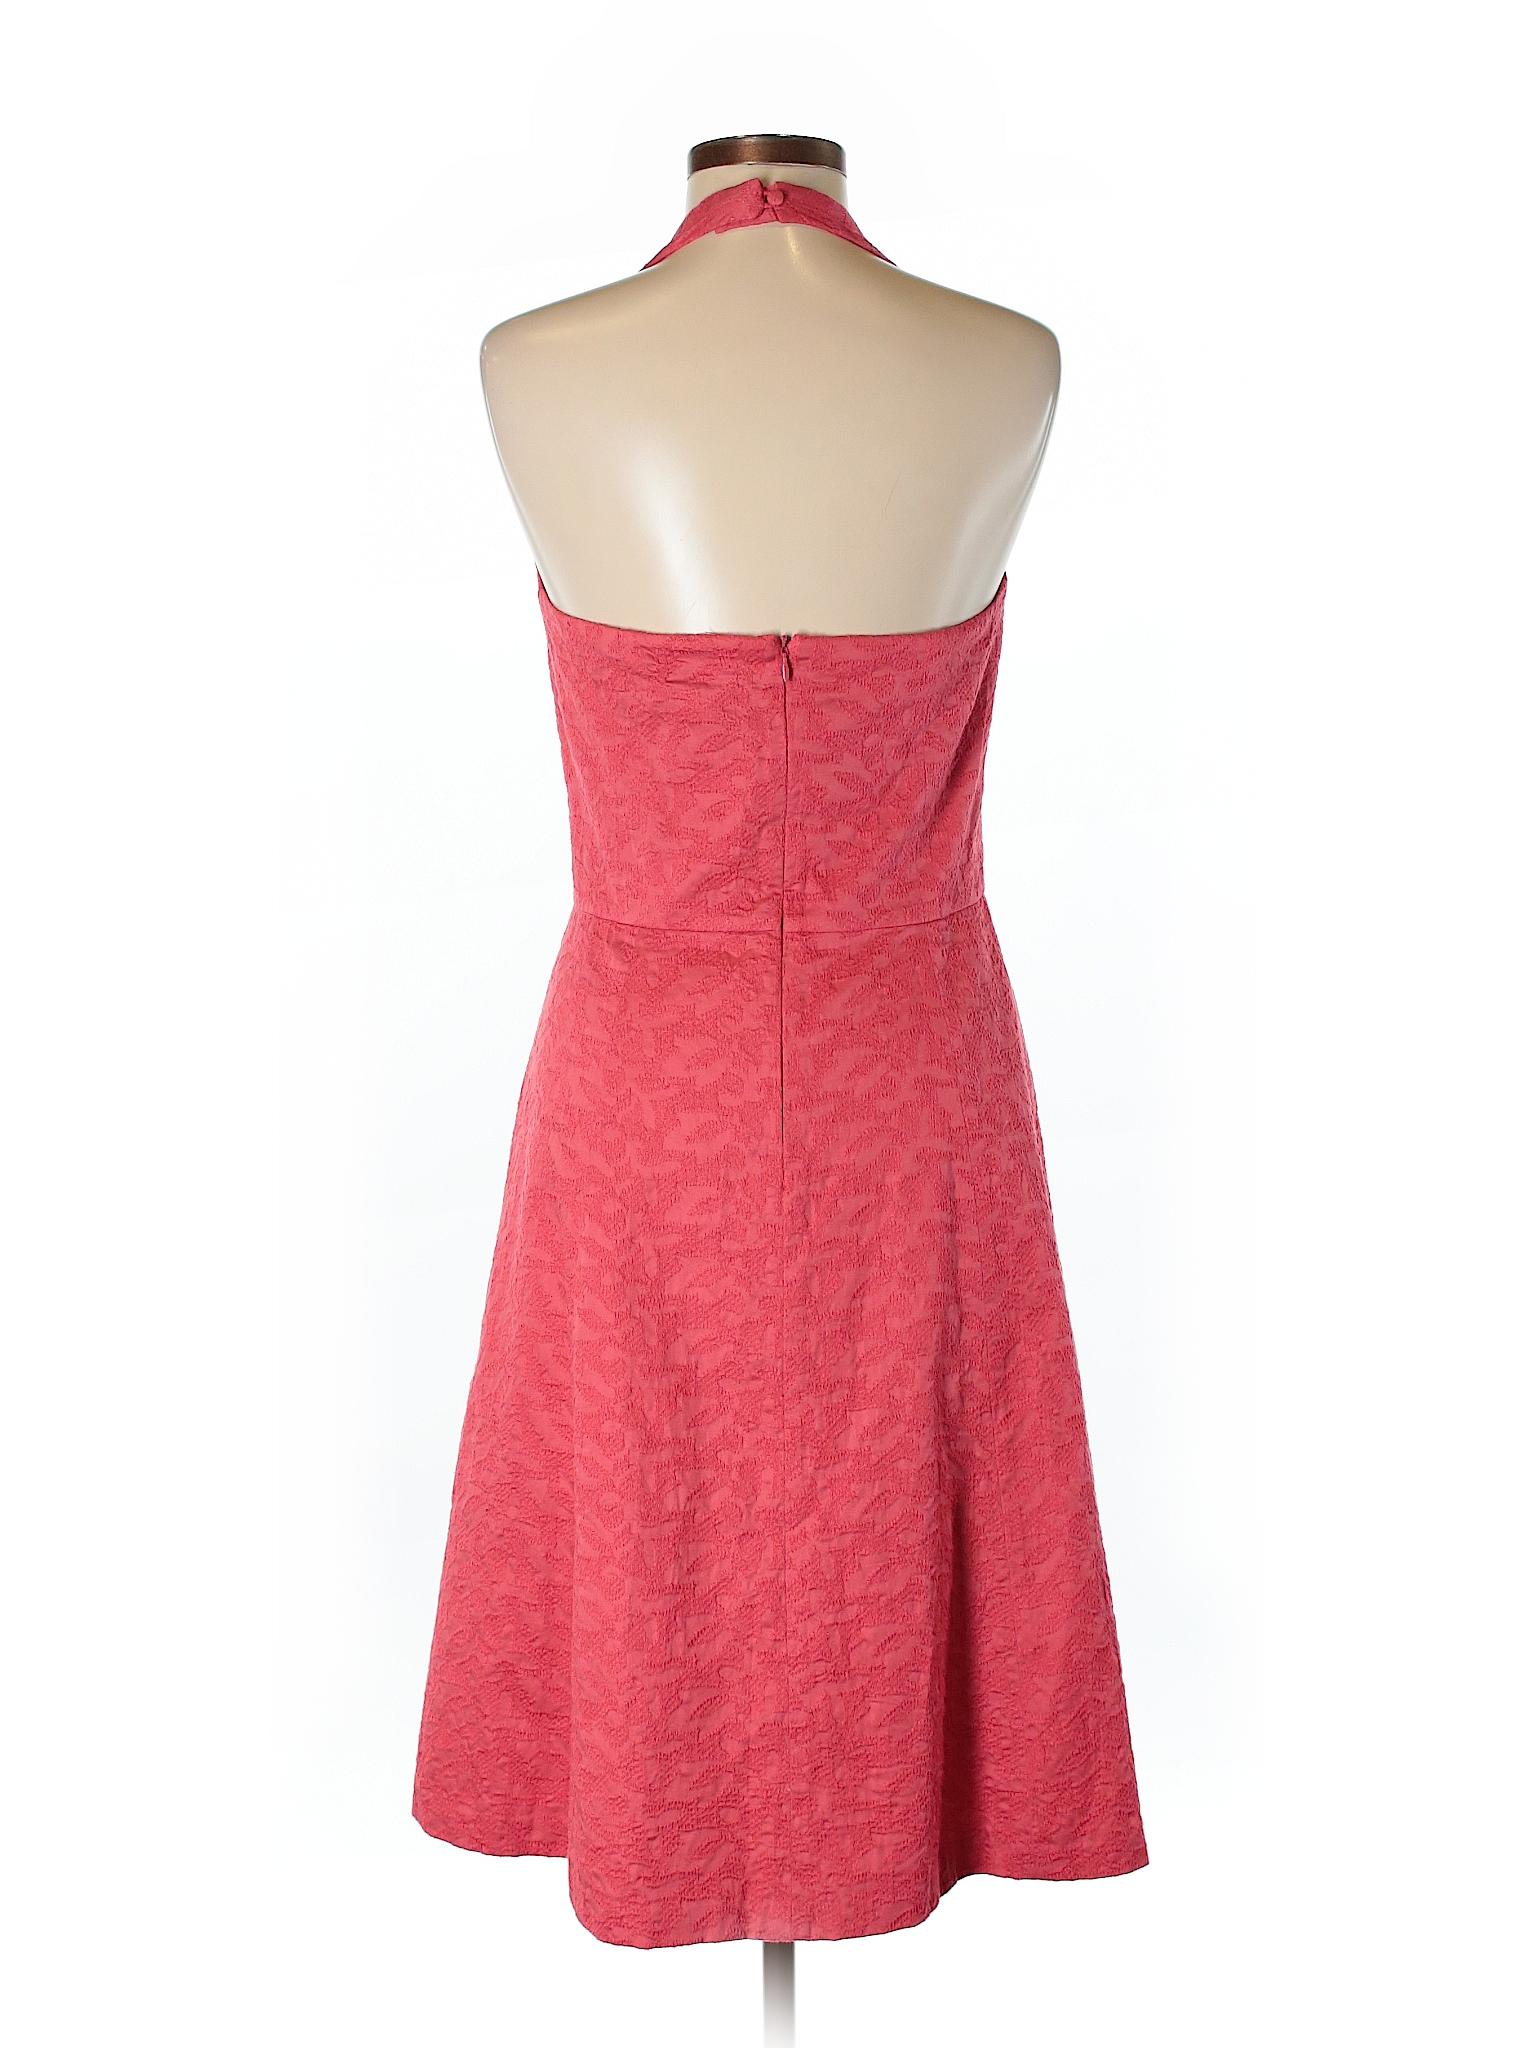 Dress Taylor Selling Dress Casual Casual Ann Selling Taylor Casual Ann Dress Taylor Selling Ann 1wAxHq